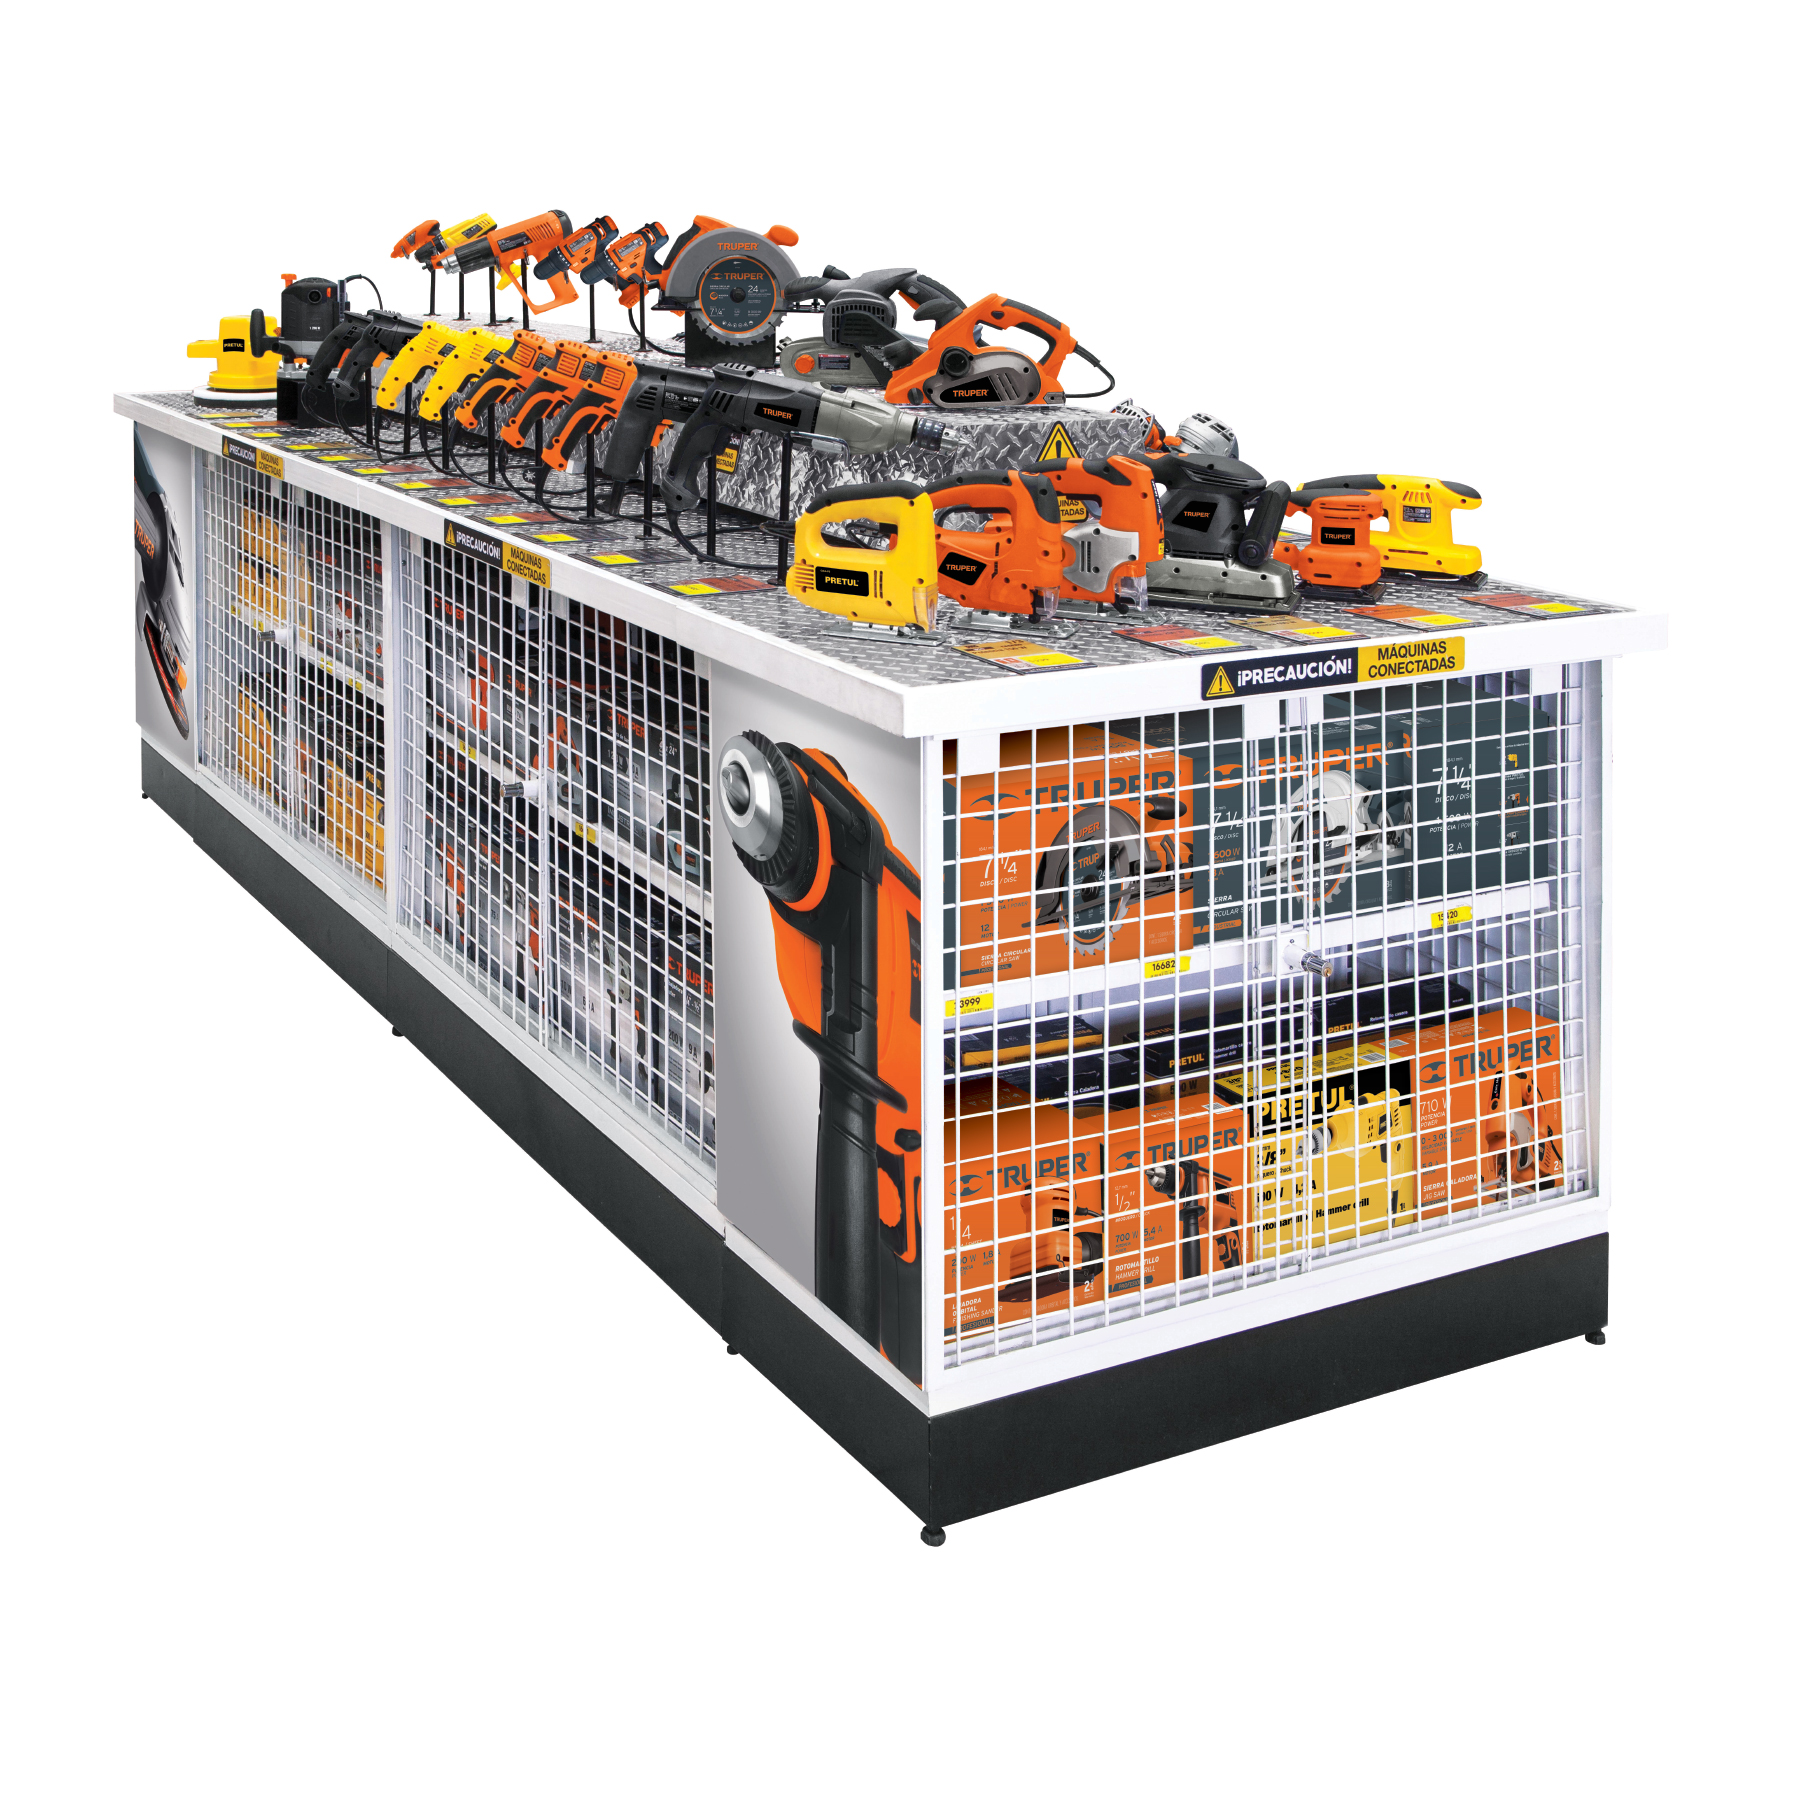 Mueble power center para herramienta eléctrica